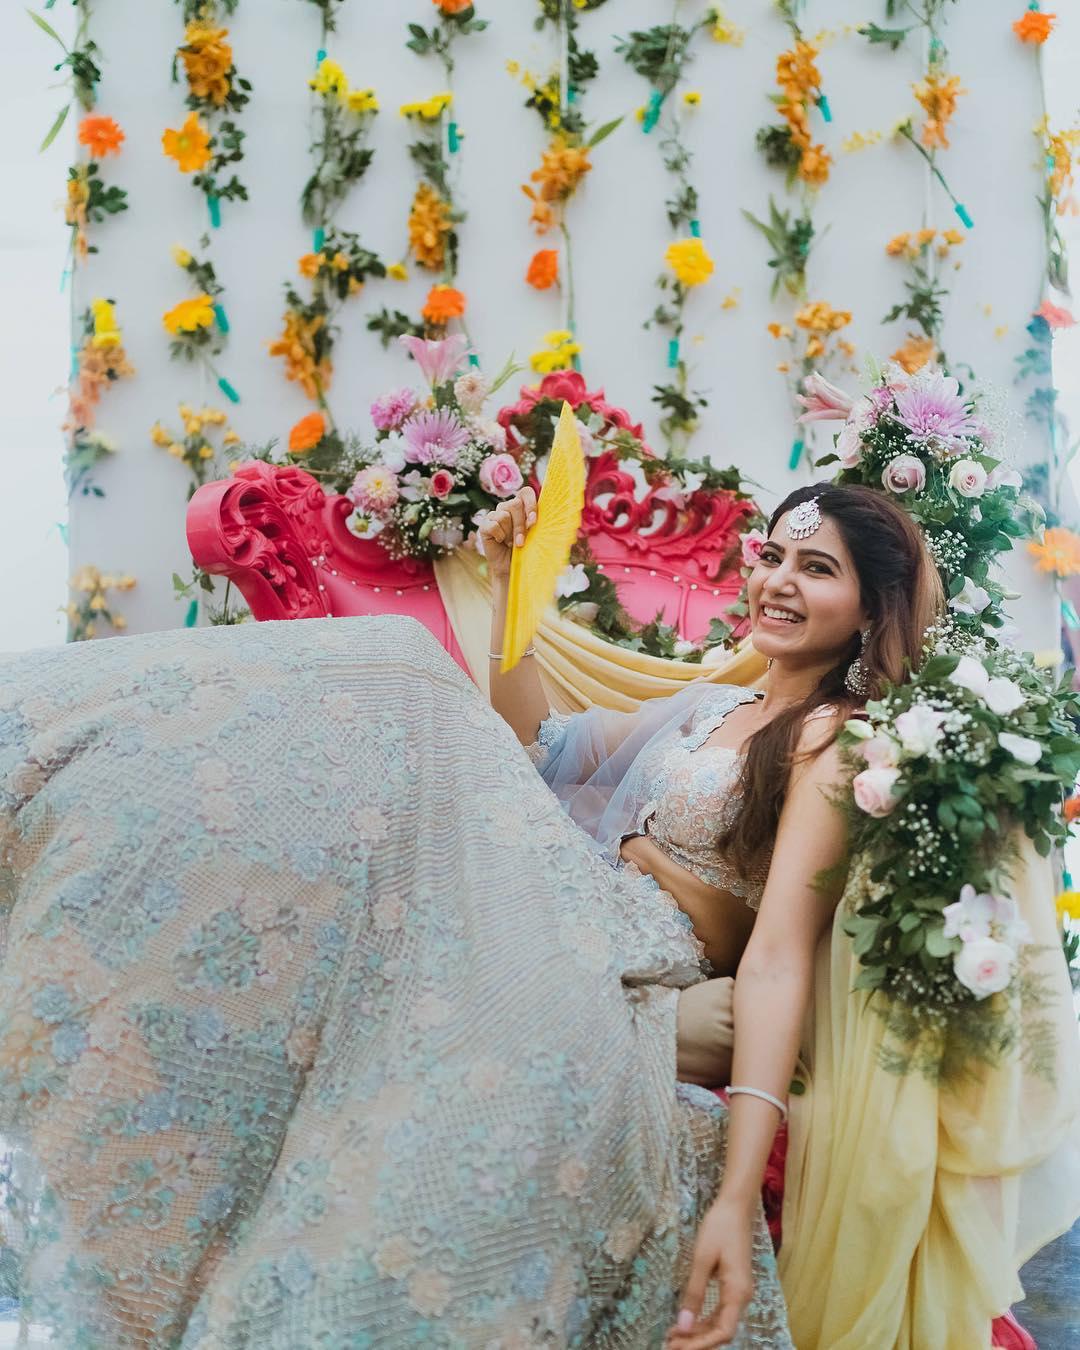 Samantha Prabhu wedding look